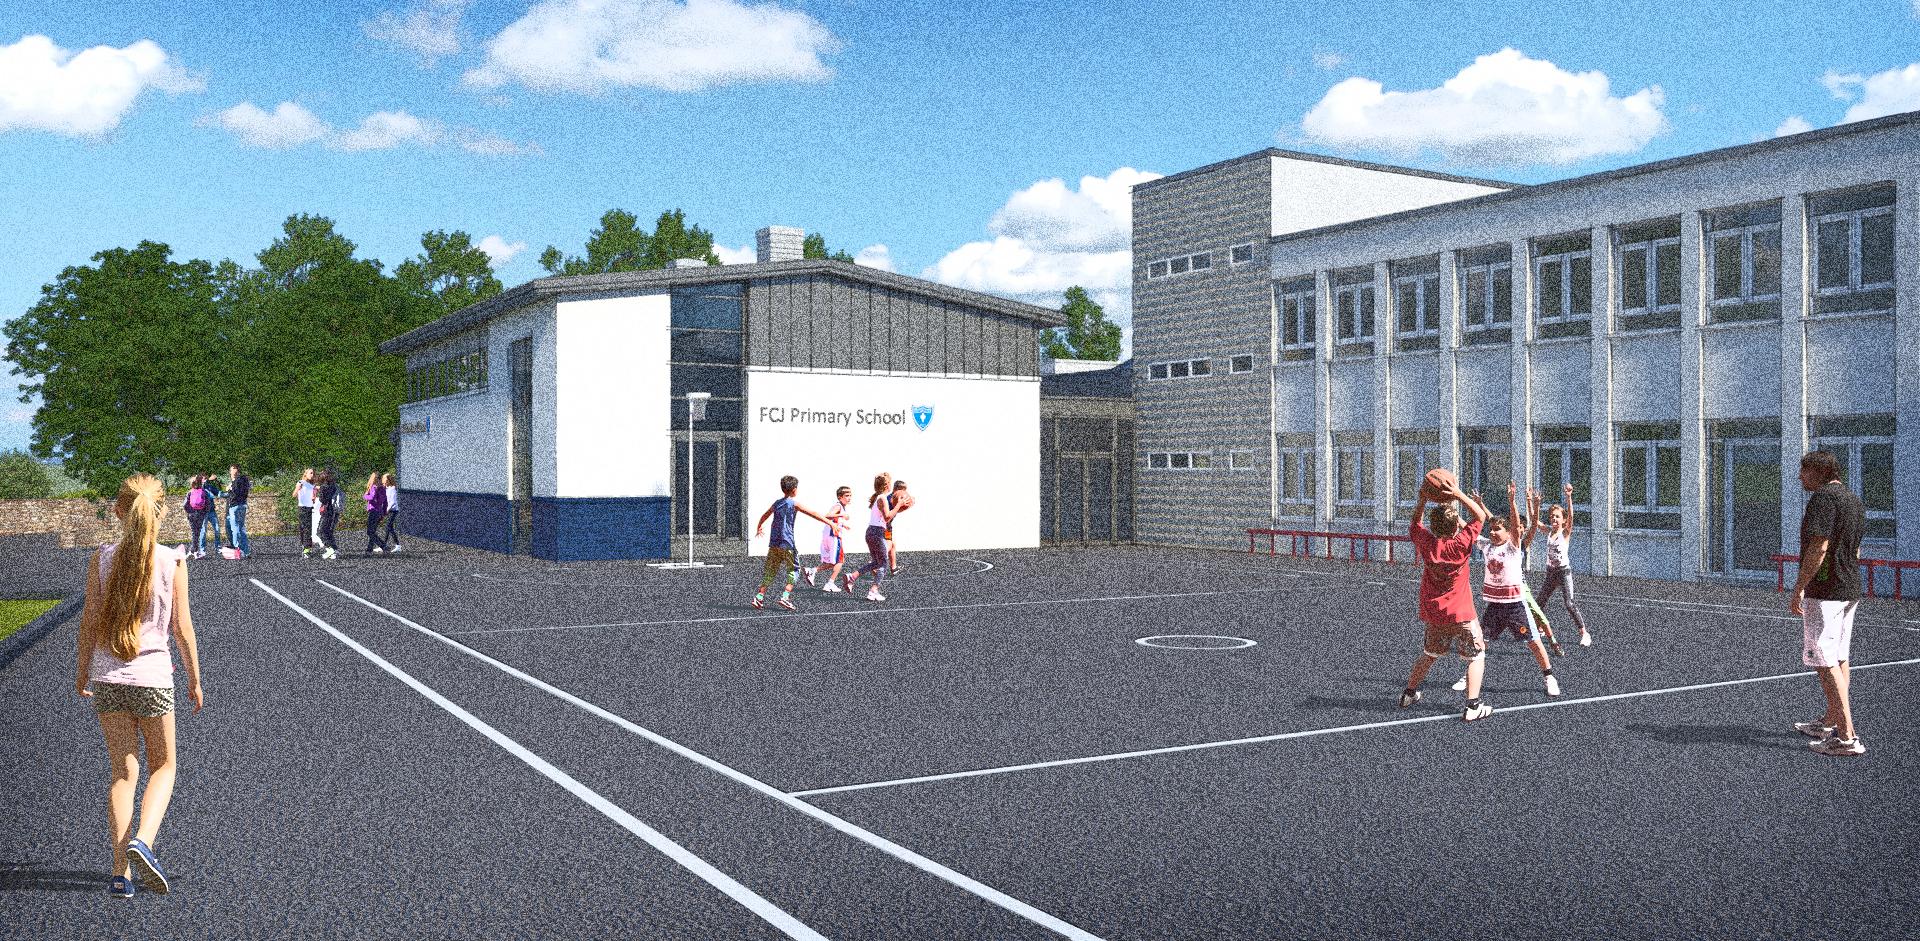 FCJ PRIMARY SCHOOL | St. Saviour, Jersey | Axis Mason